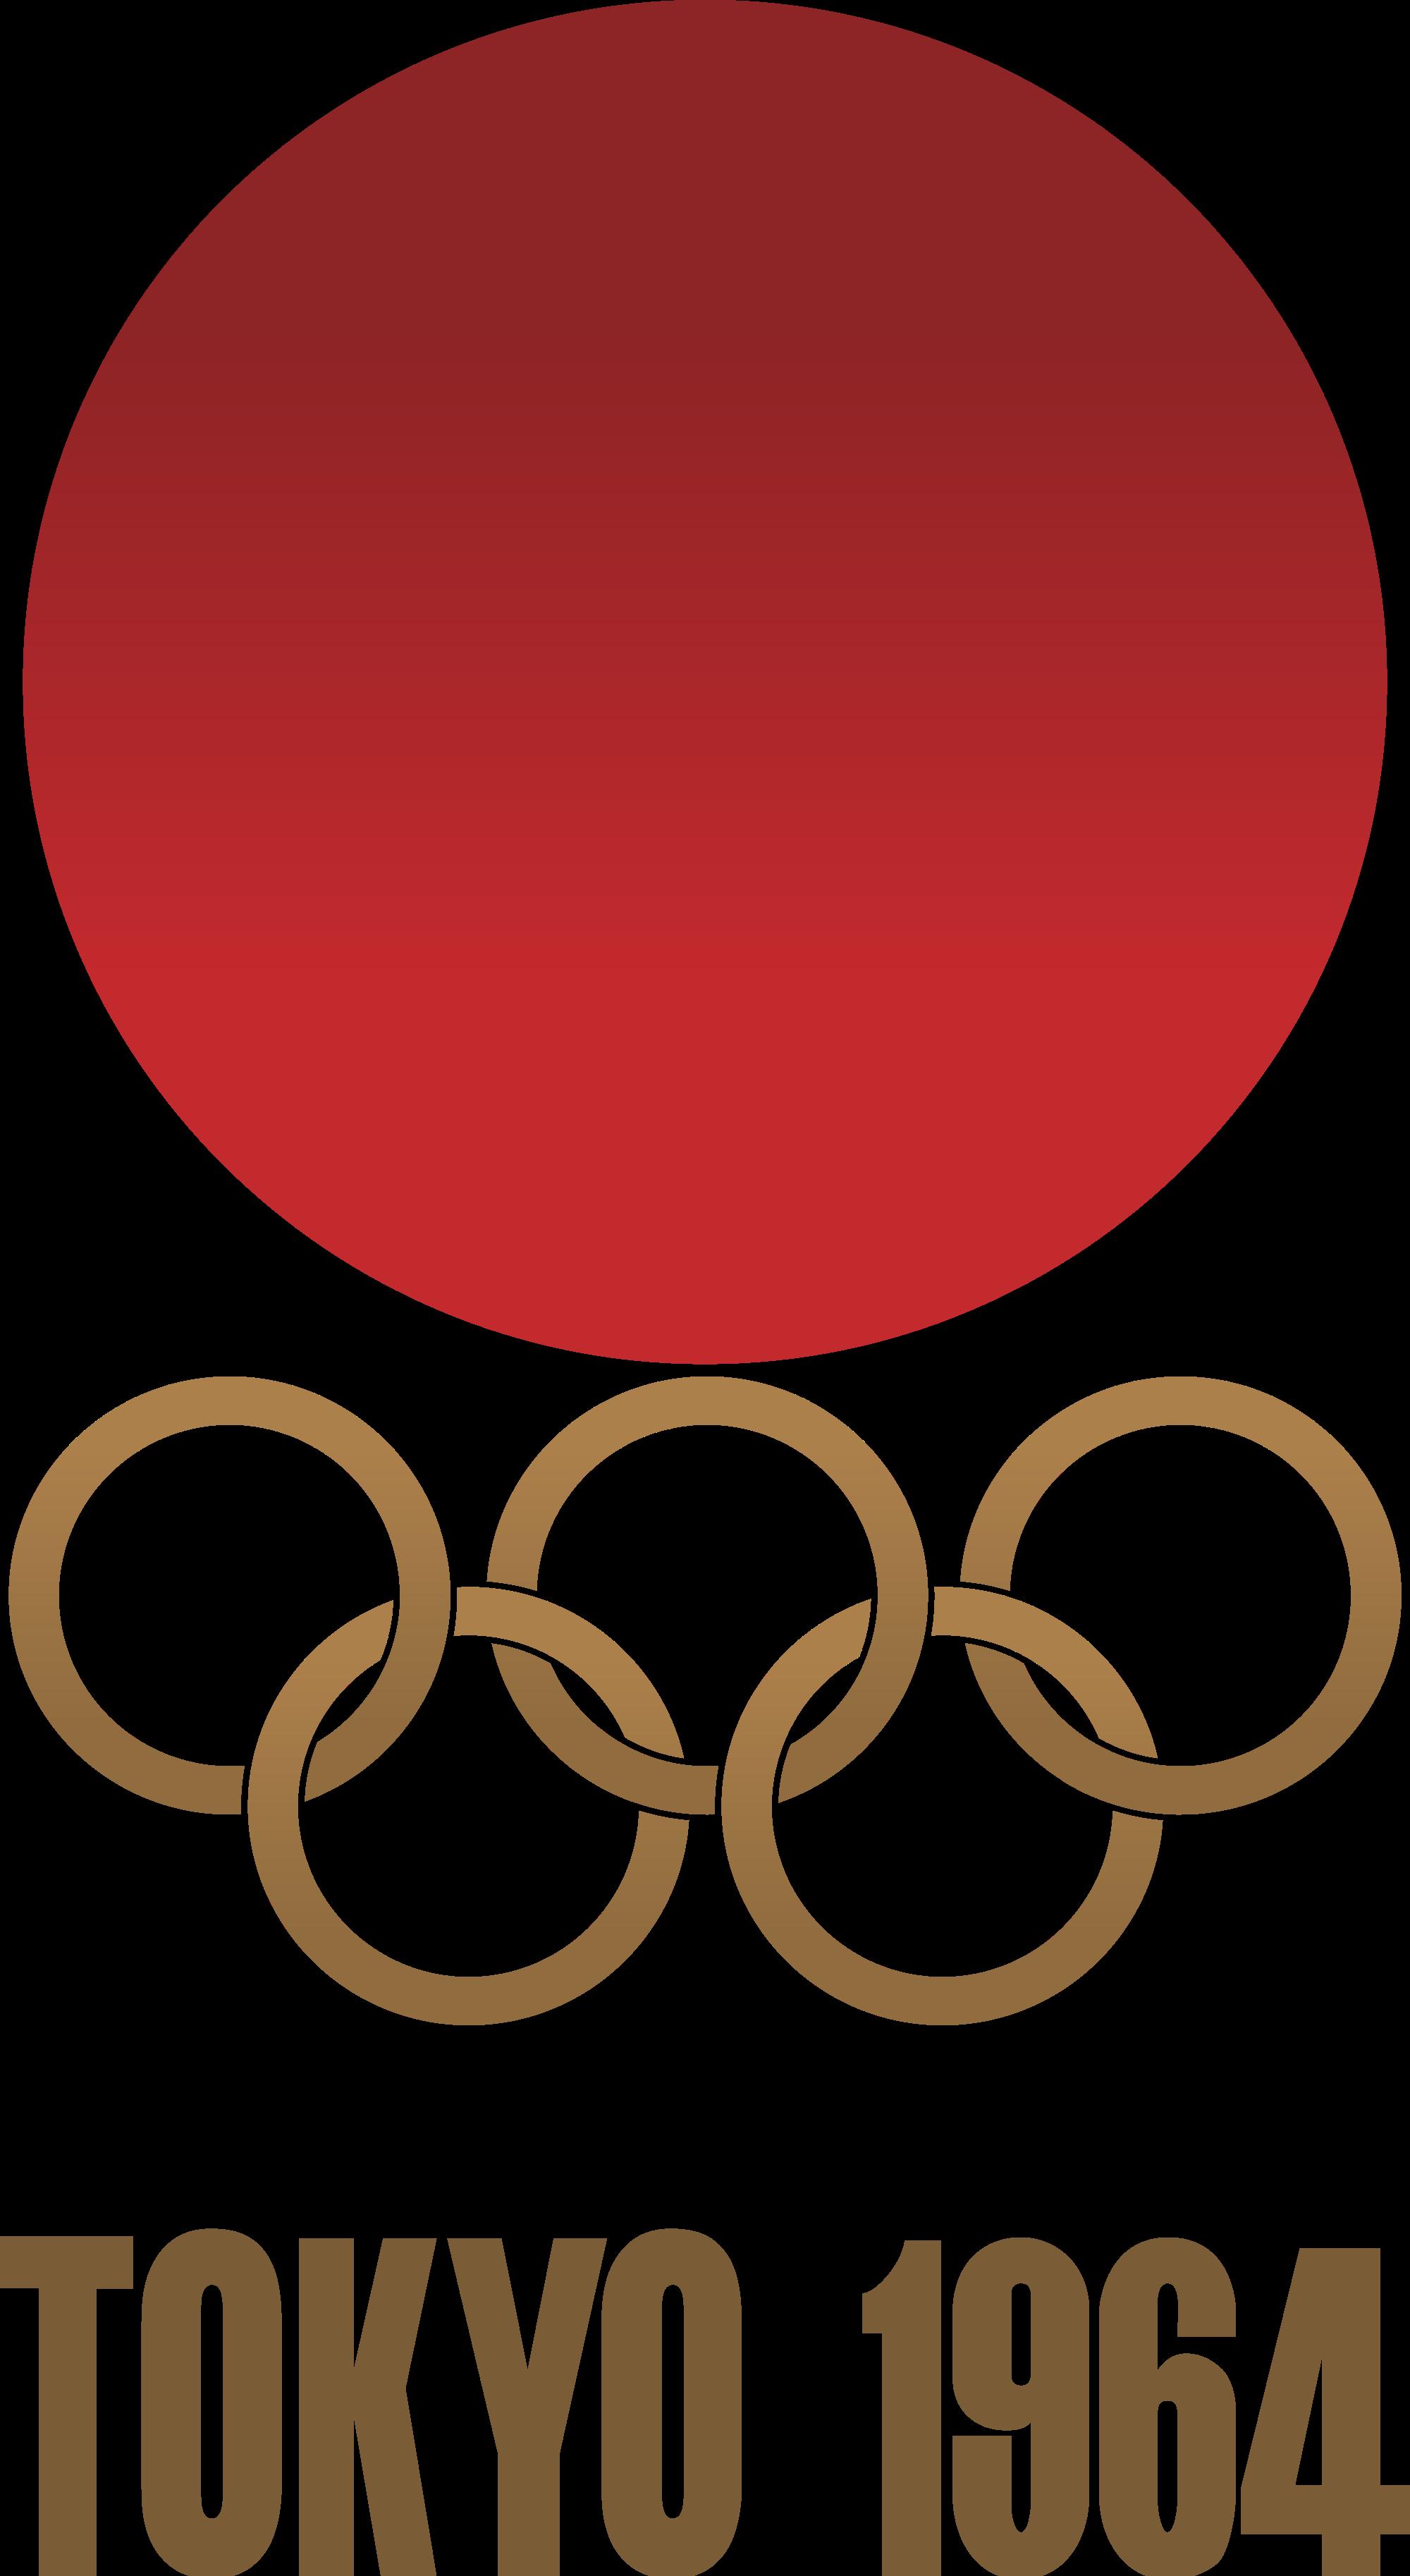 Summer logos iwork alex. Olympics clipart olympic games